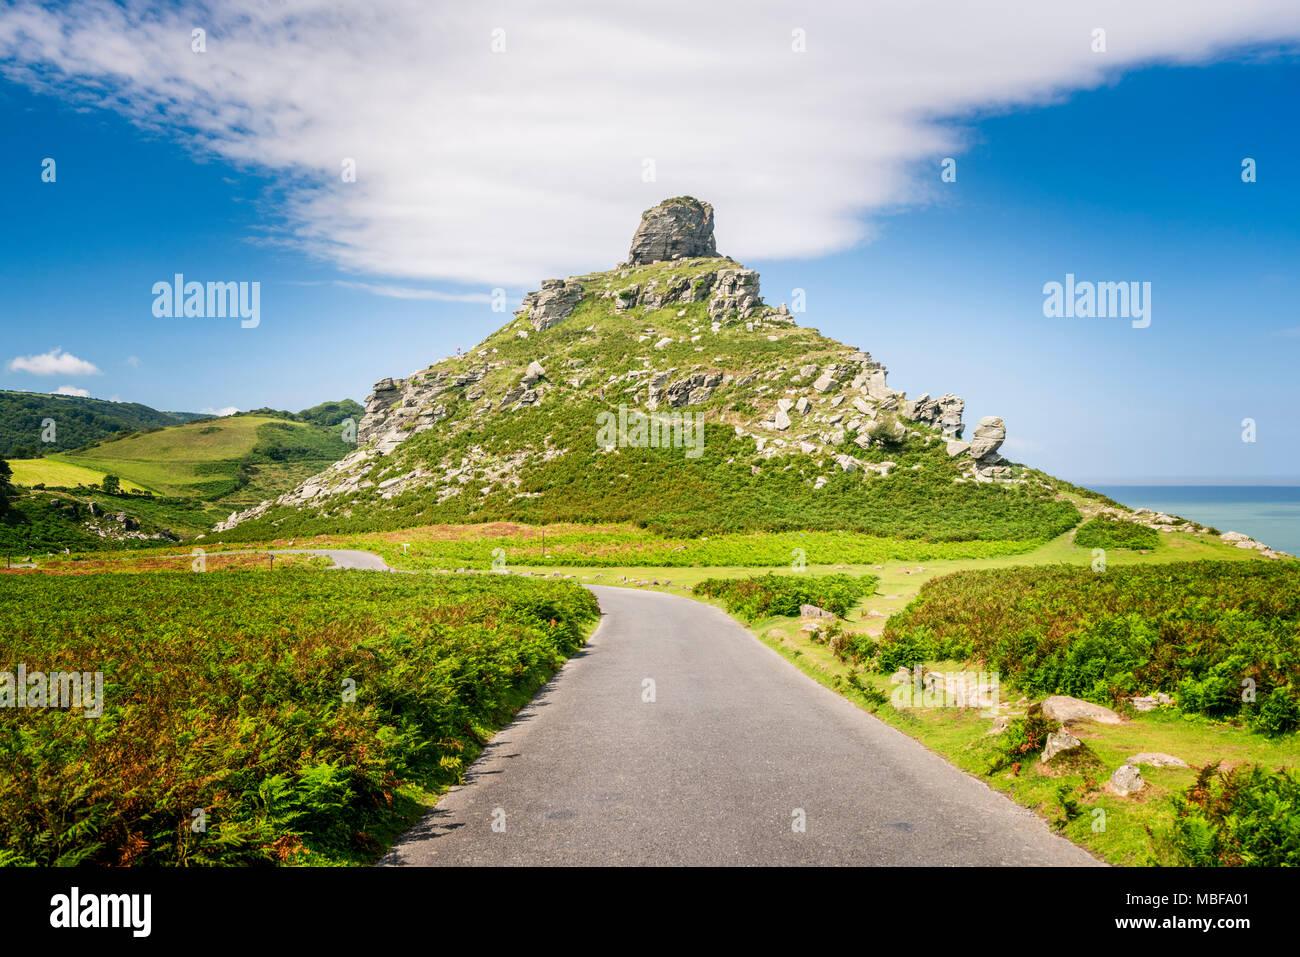 Landscape of Valley of the Rocks in Exmoor National Park, Devon, England UK - Stock Image